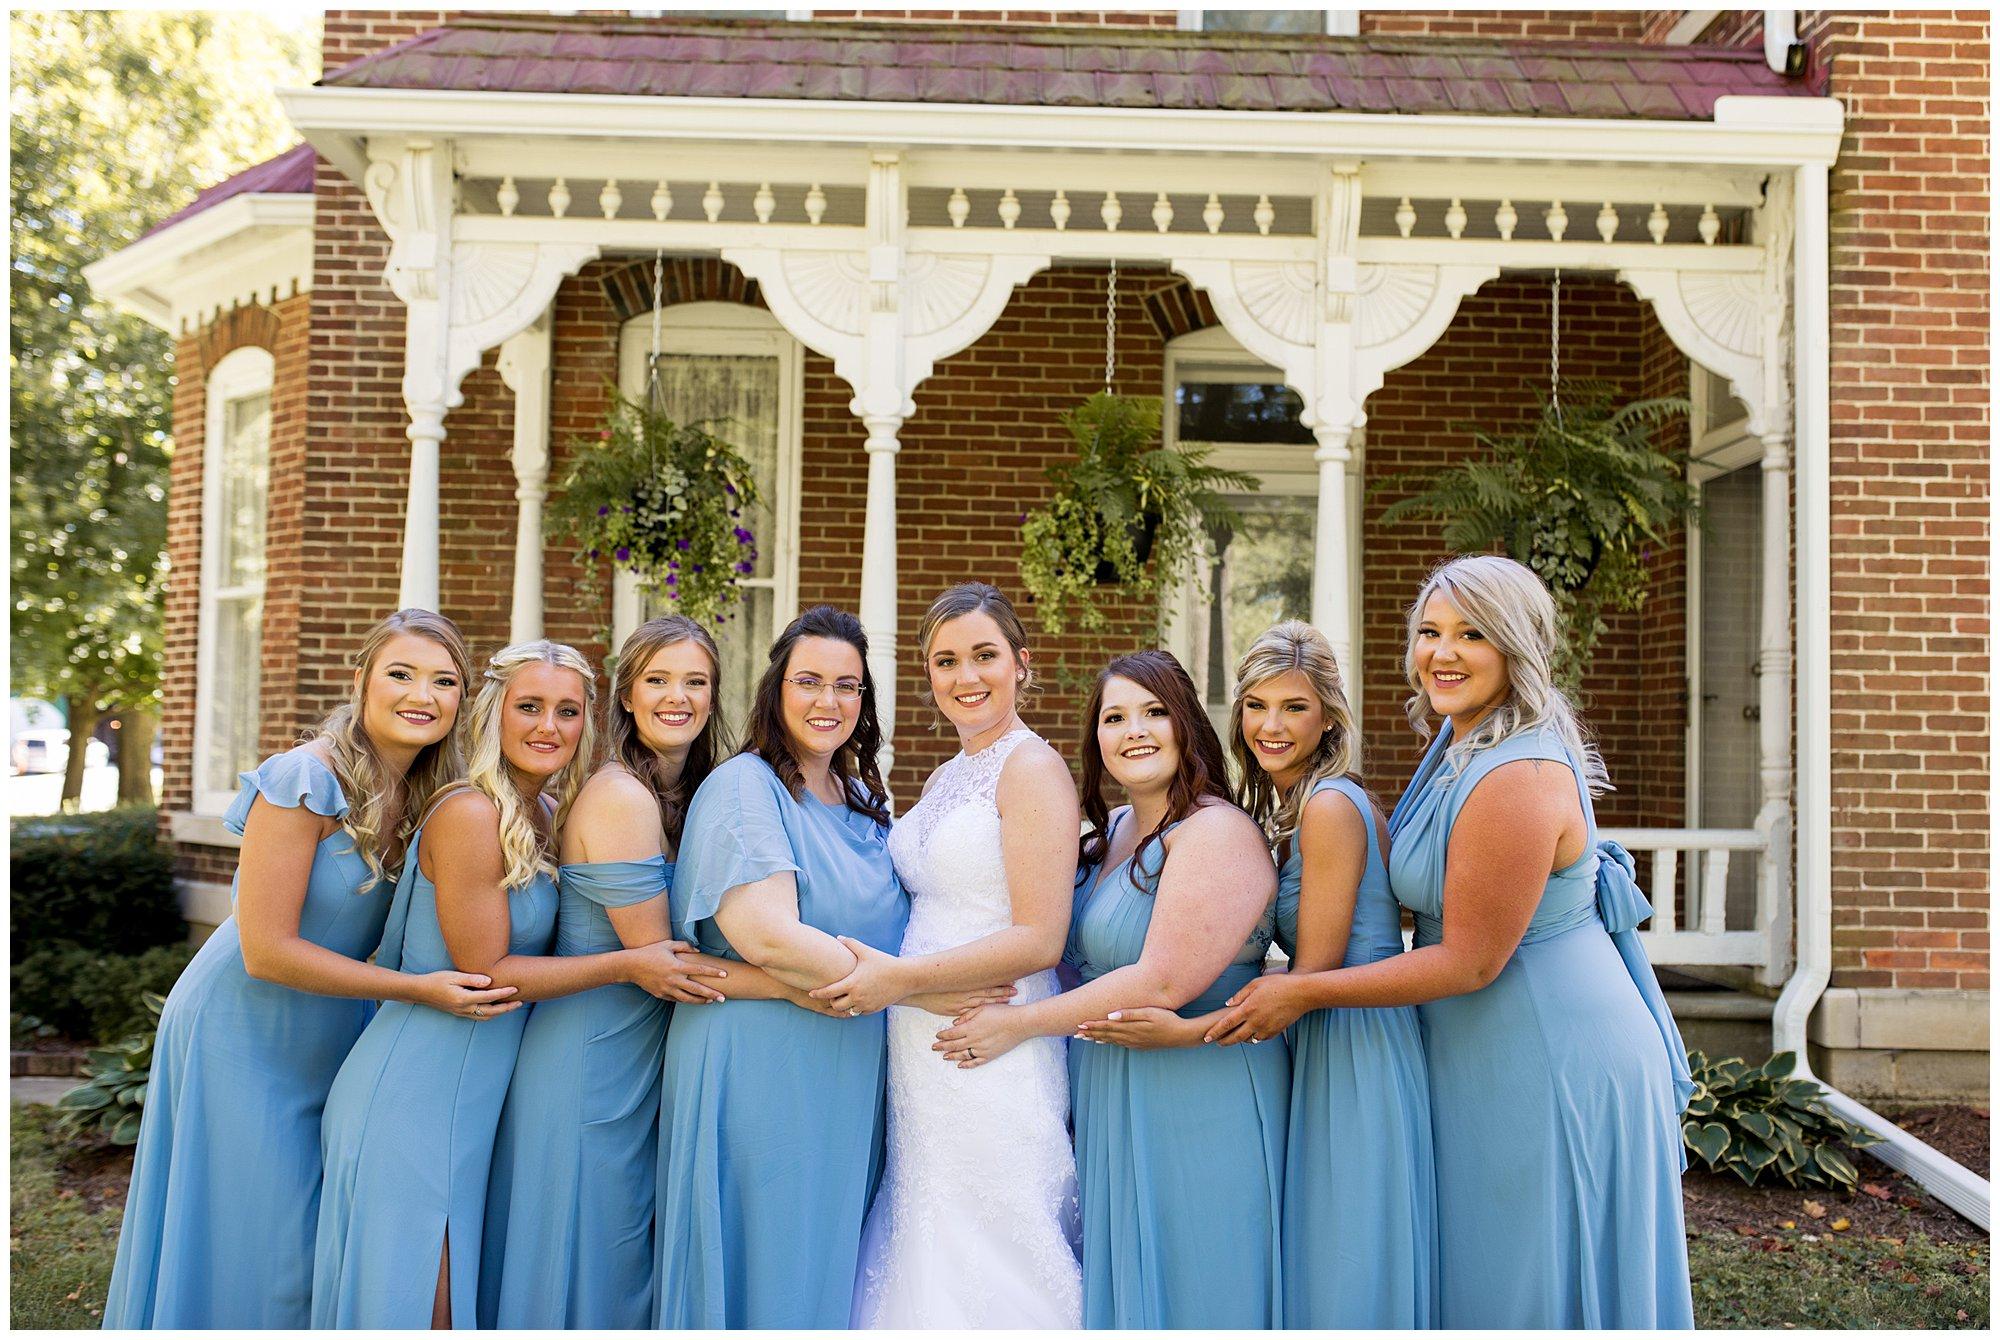 bride and bridesmaids photos before wedding ceremony at Legacy Barn in Kokomo